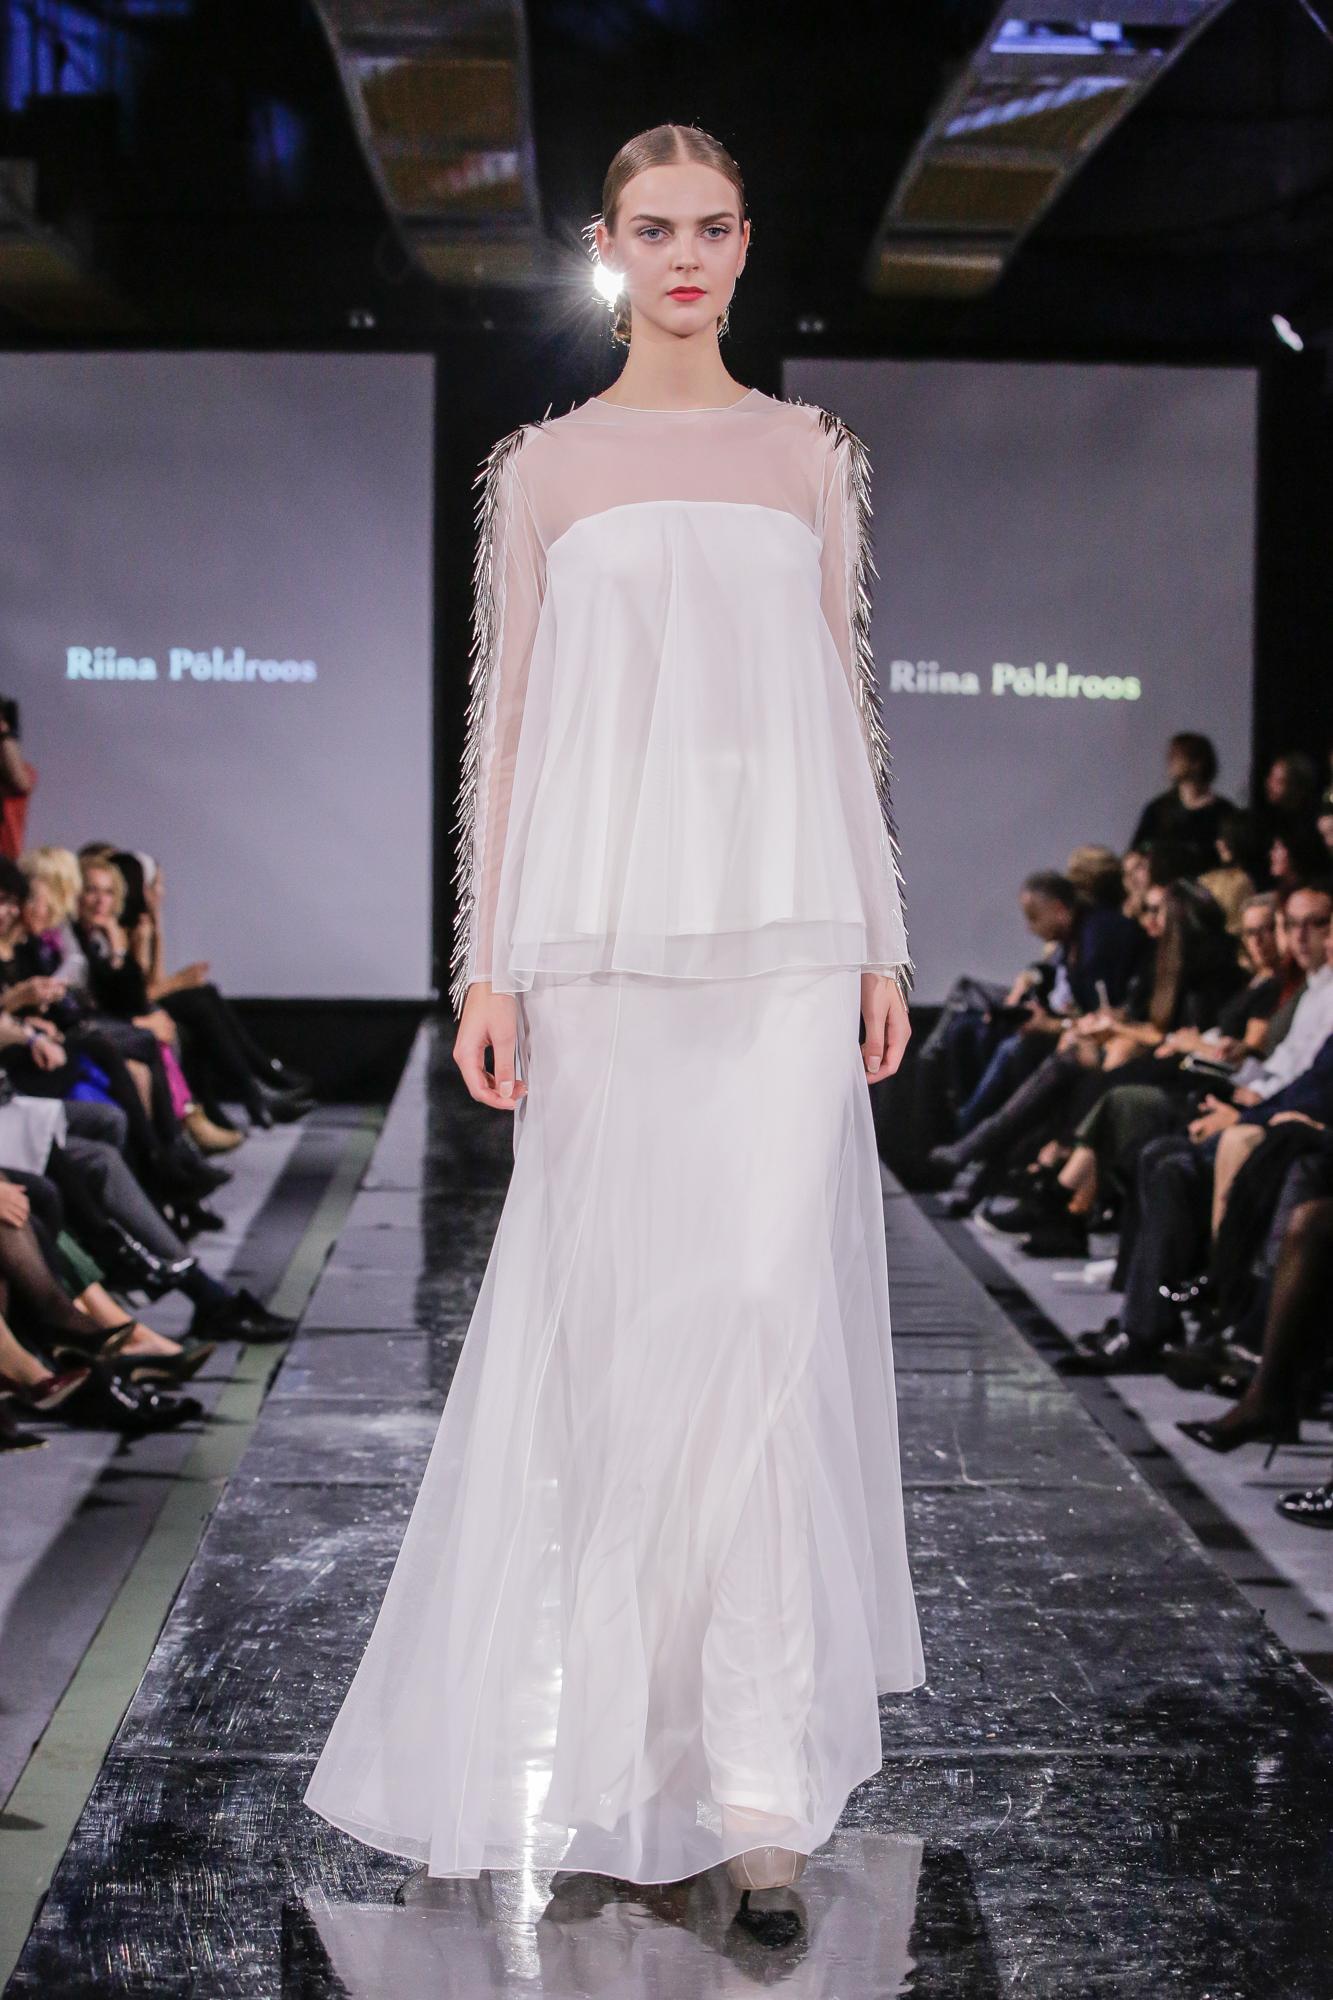 Riina Põldroos x Embassy of Fashion (TFW 2015)